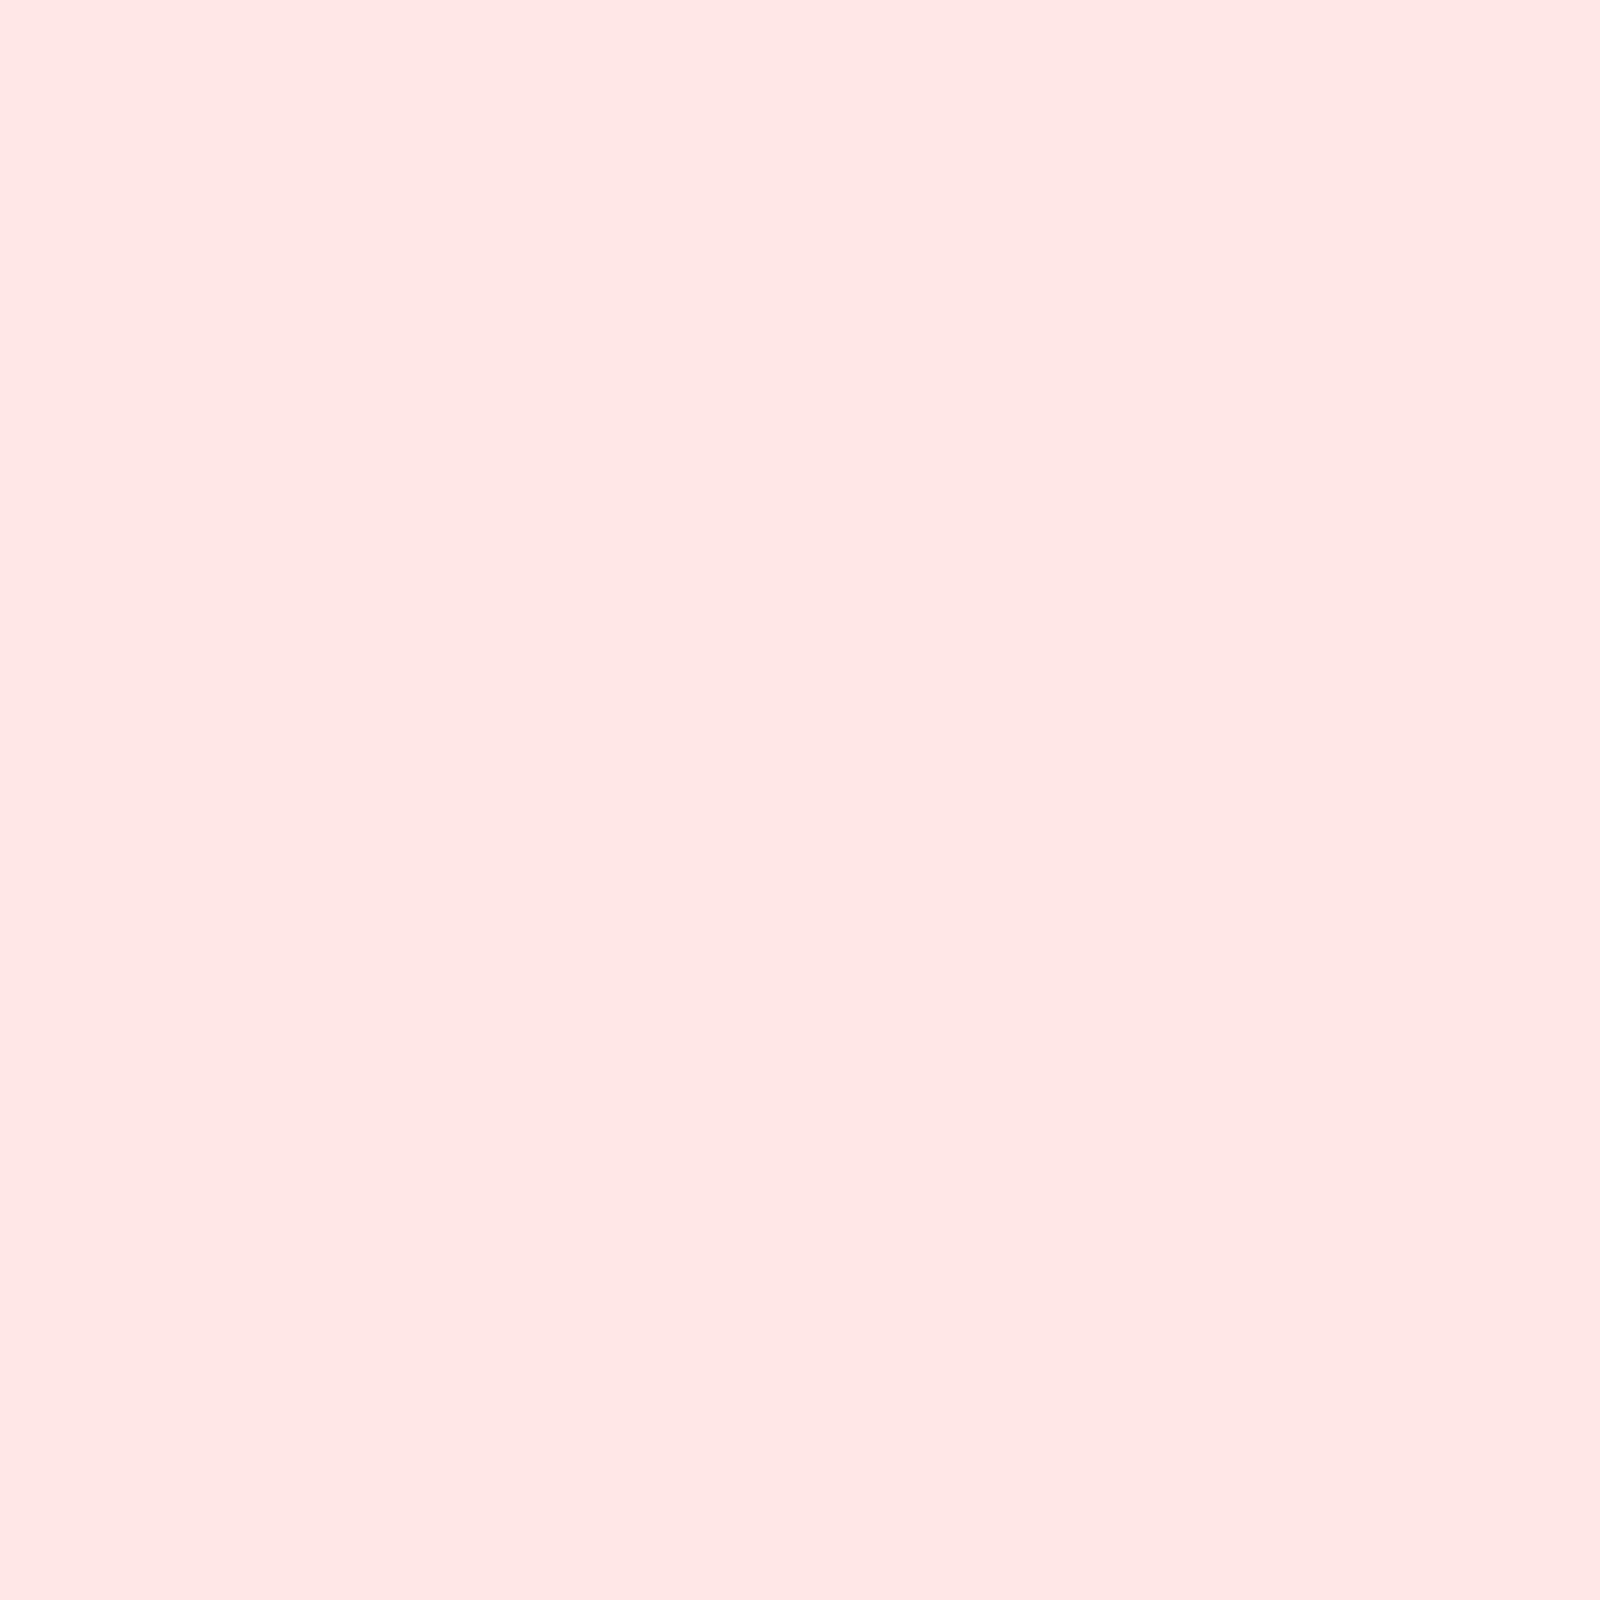 Tula Pink Designer Essentials Solids - Unicorn Poop - Peachfuzz